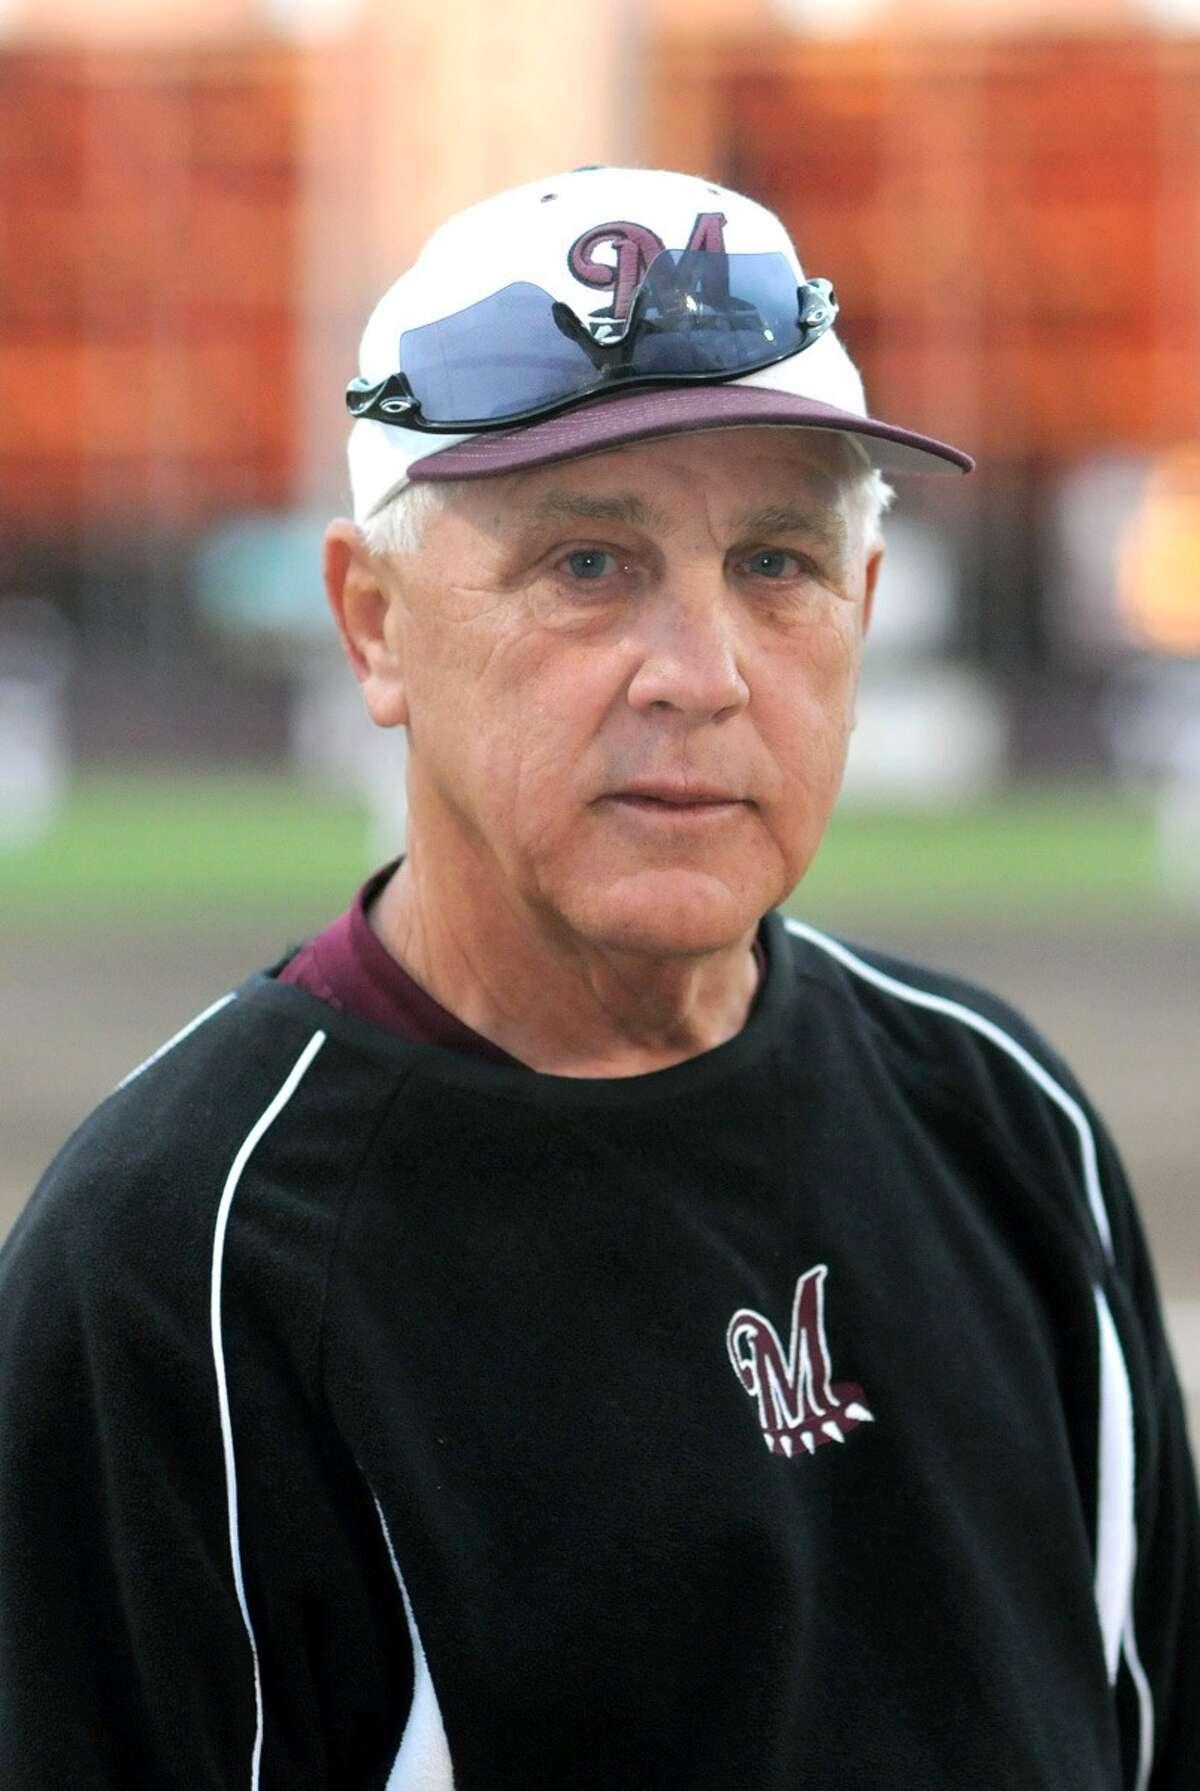 Magnolia head coach Dale Westmoreland